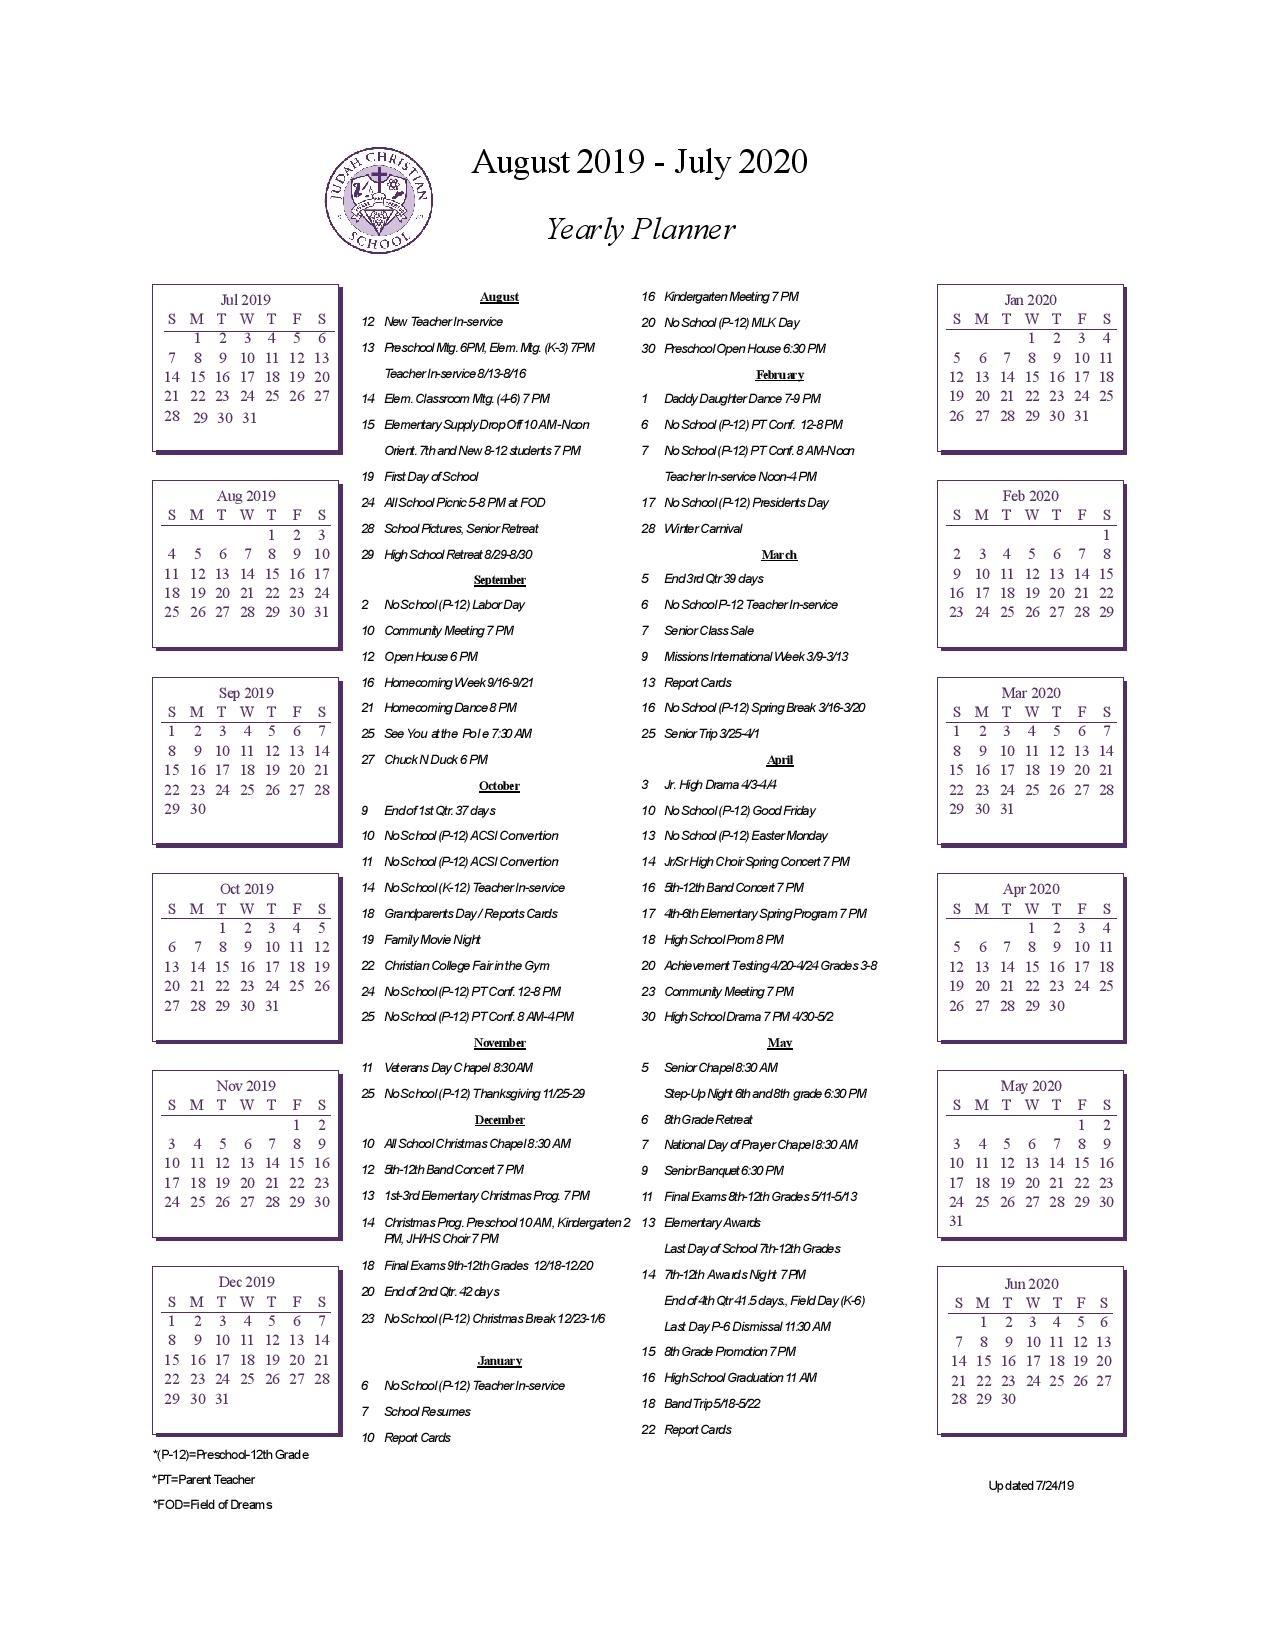 School Calendar - Judah Christian School